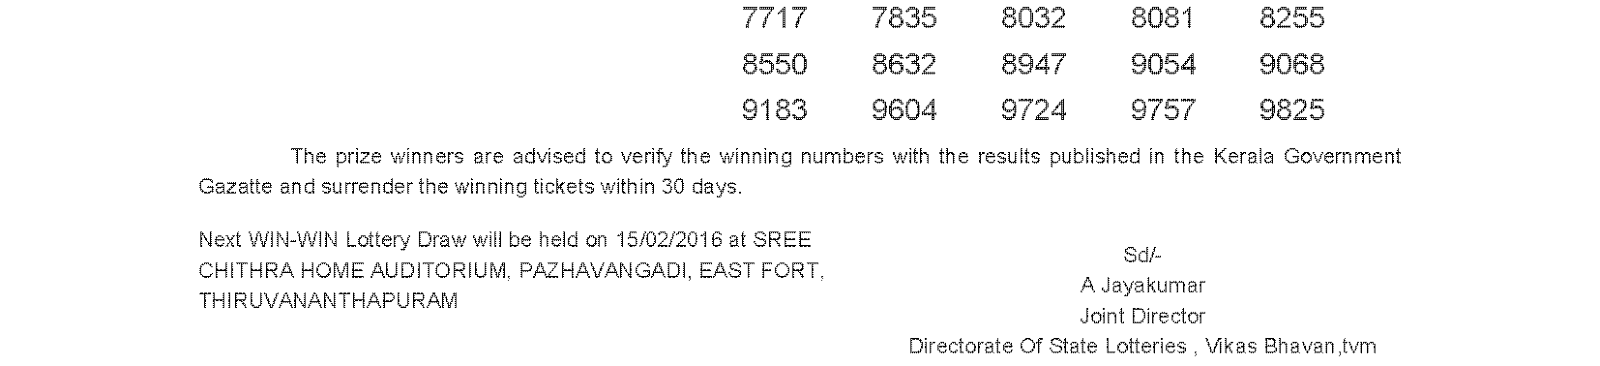 http://www.keralalotteryresult.org/2016/02/win-win-lottery-w-346-lottery-result-08-02-2016.html